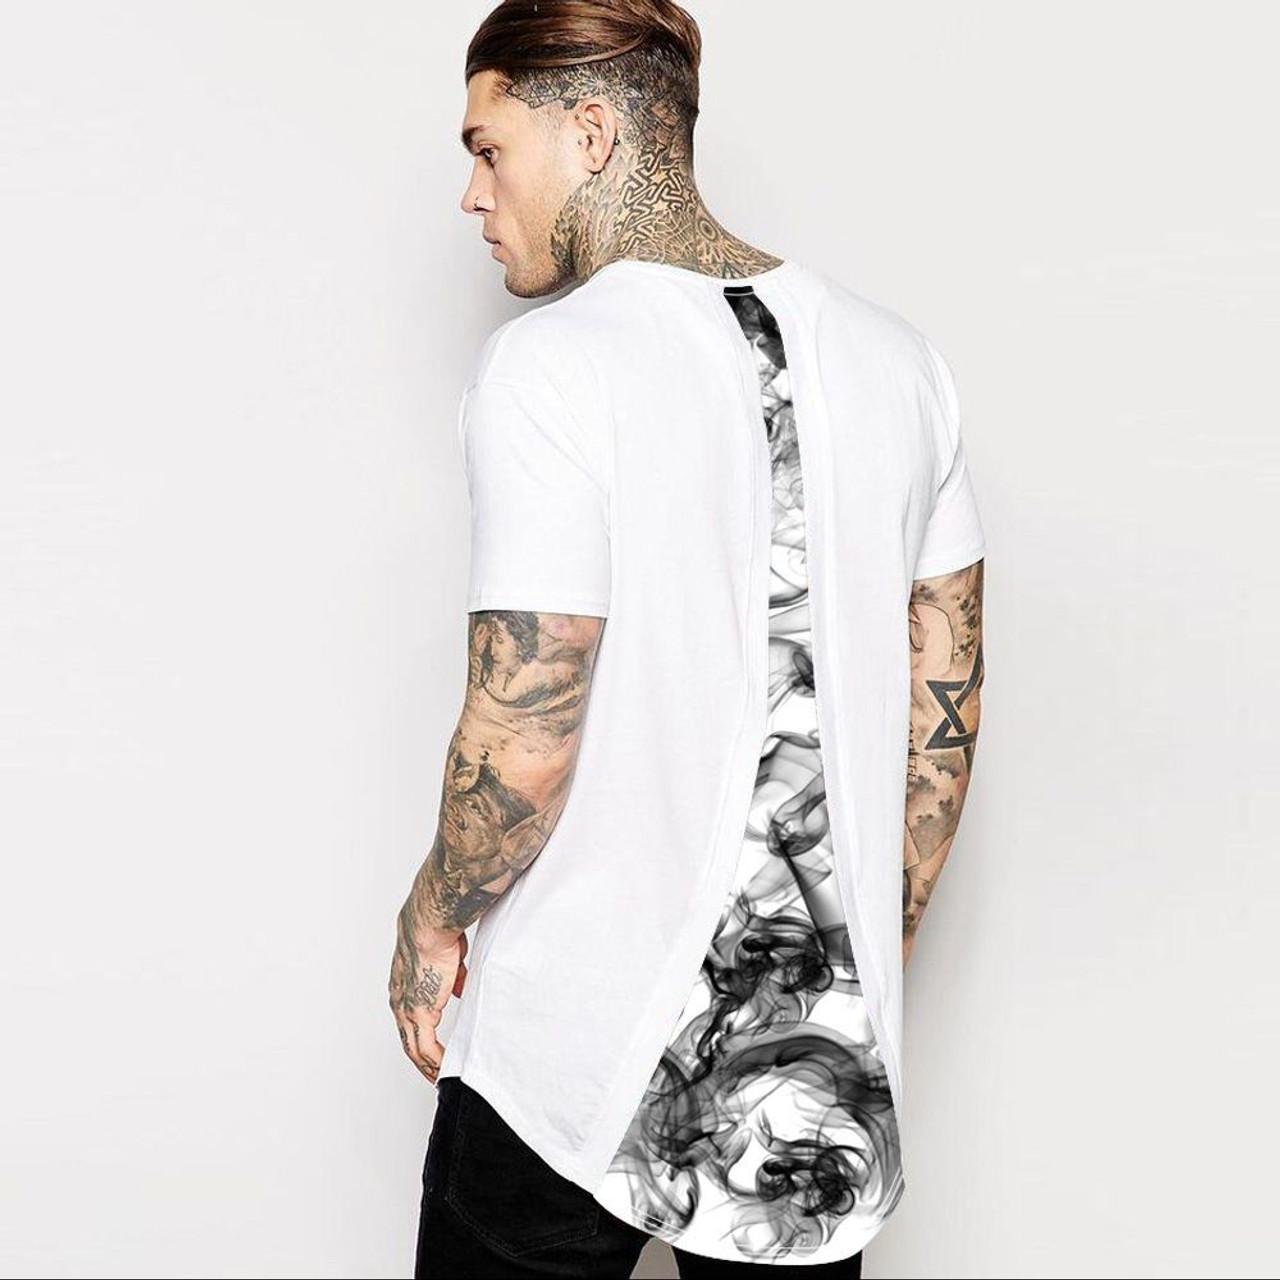 ... Echoinne 2018 Summer Casual Printed 3D T-shirt Men Cool Printed Size  M-2XL ... 5999dddbe56